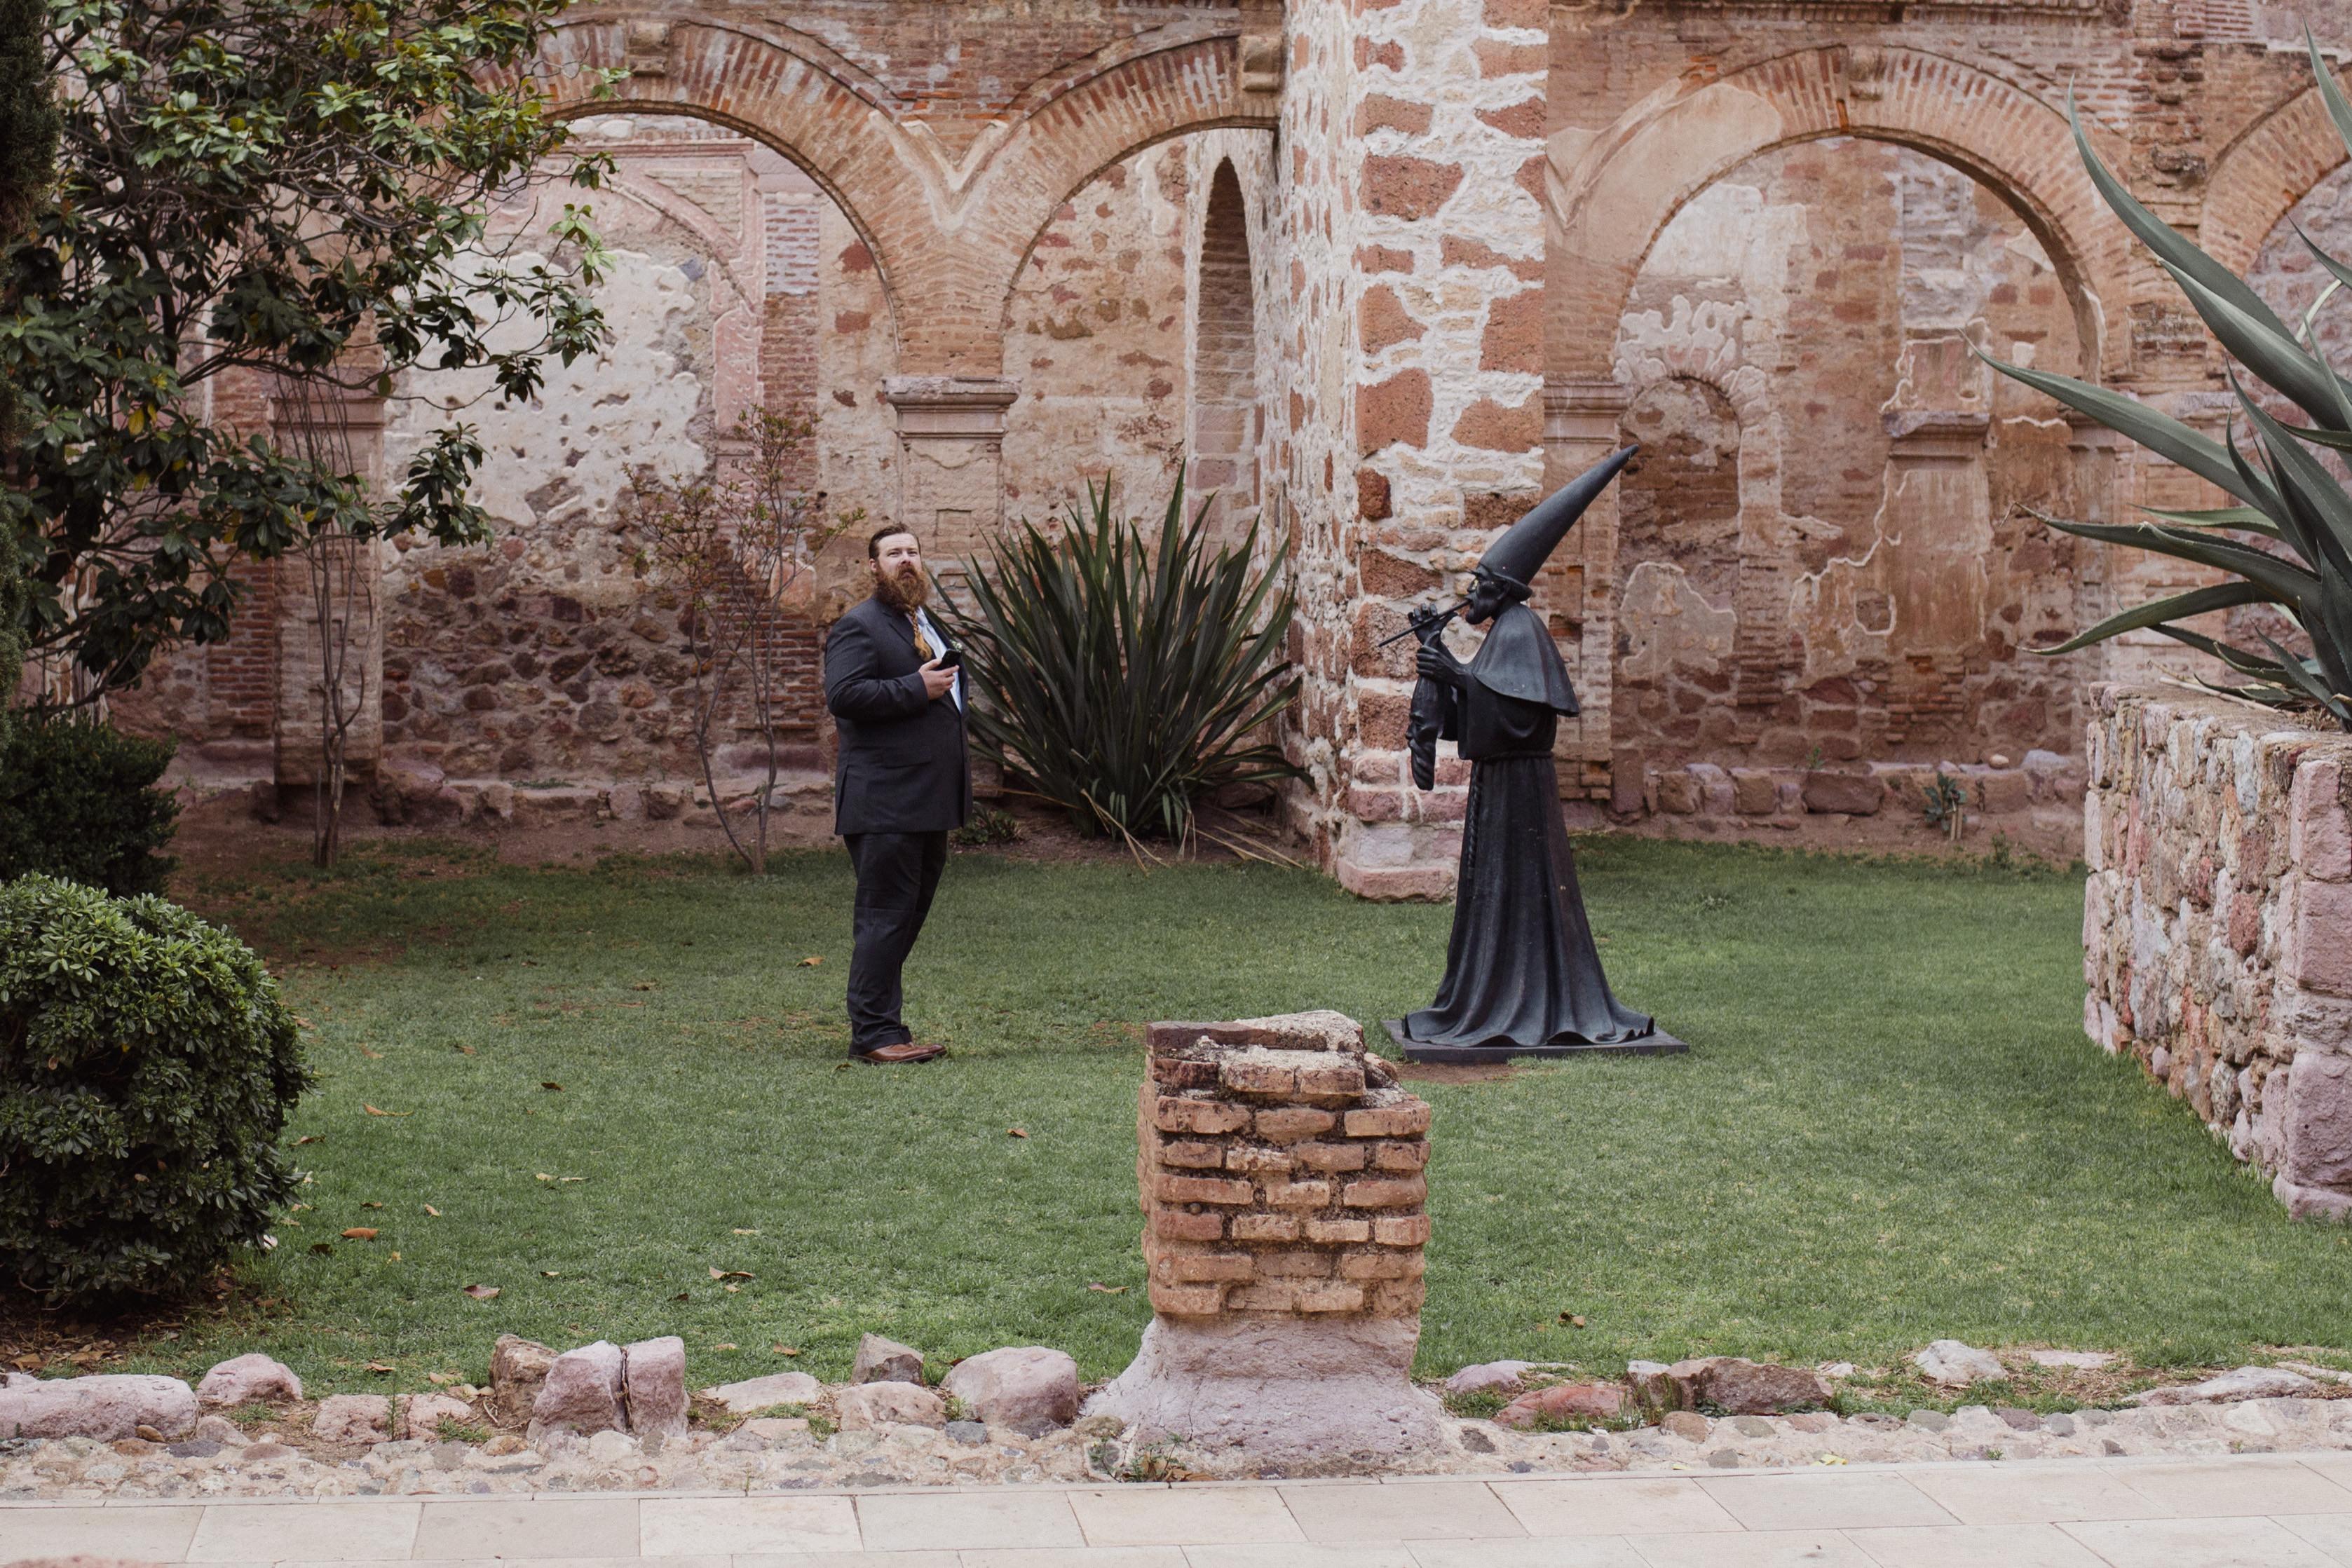 javier_noriega_fotografo_profesional_bodas_zacatecas_mexico_chihuahua_photographer43